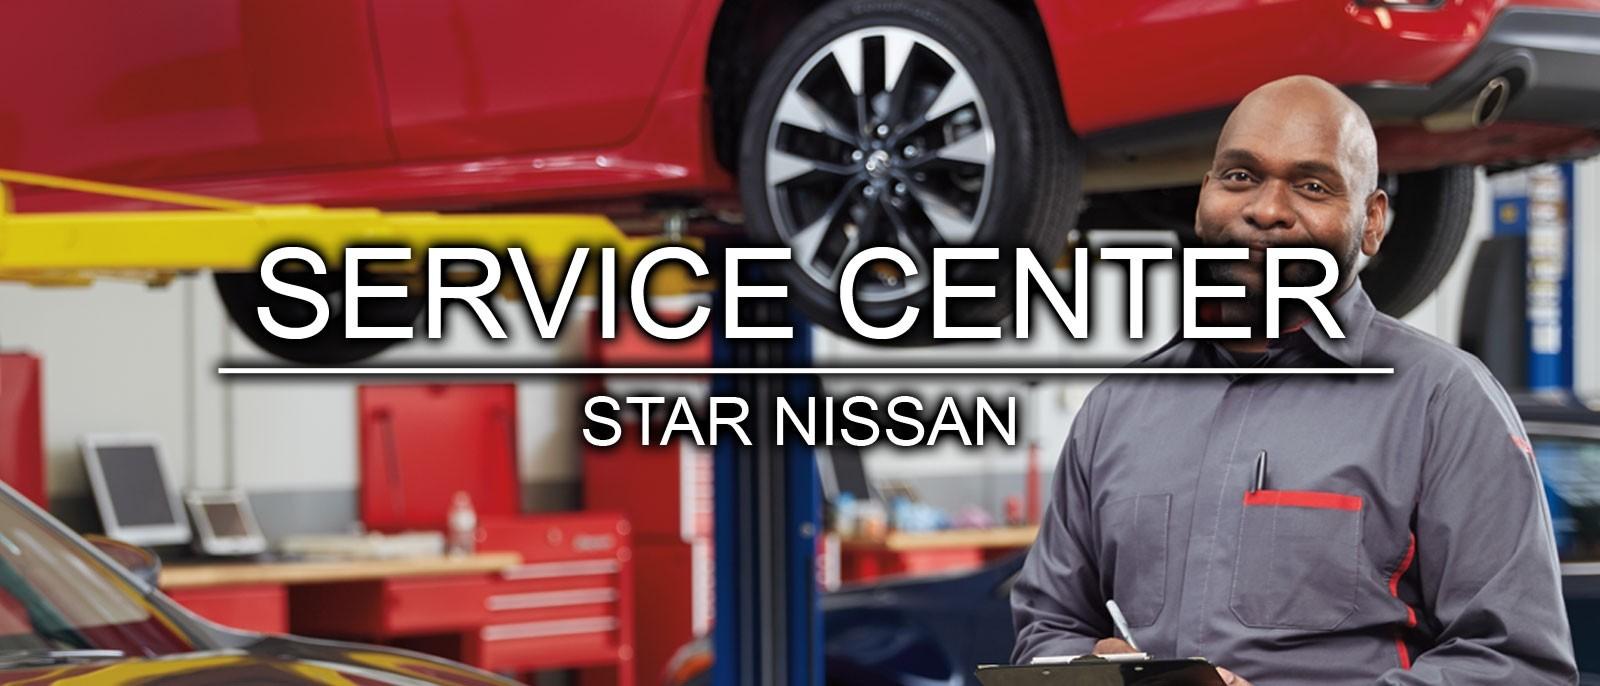 Star Nissan Service